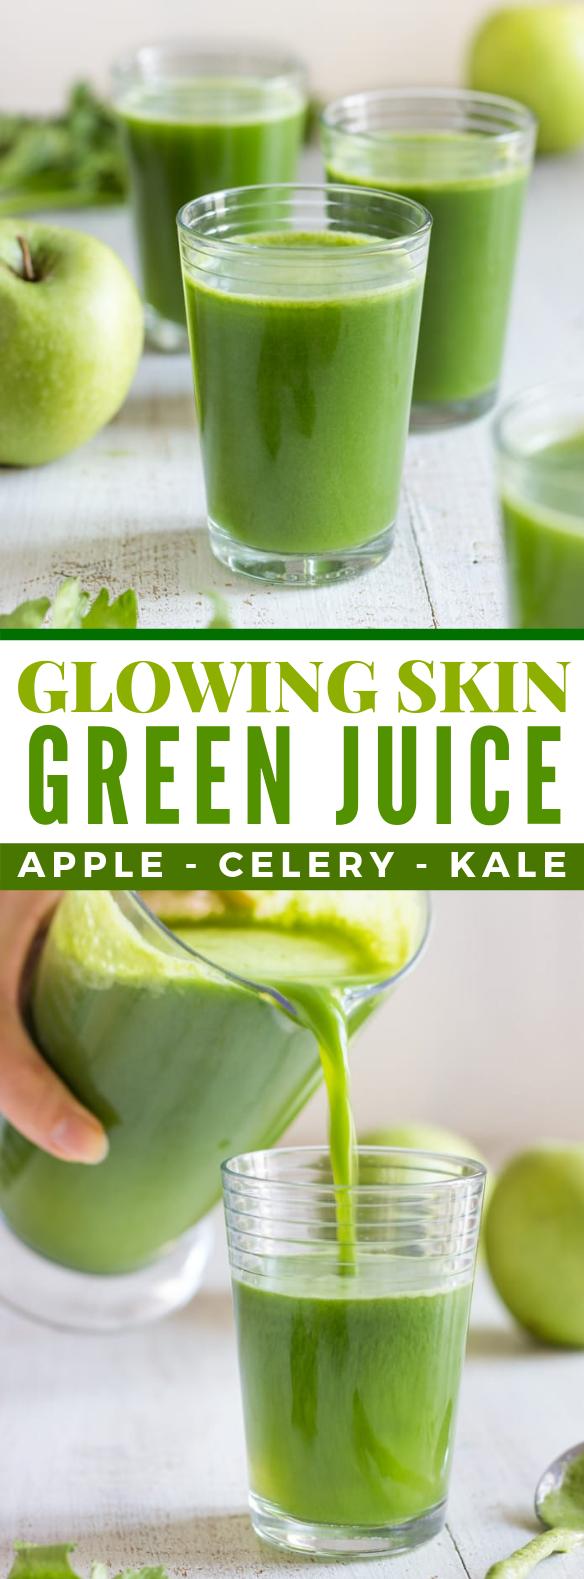 Glowing Skin Green Juice Drinks Juicer Healthydrinks Glowingskin Apple Green Juice Smoothie Green Juice Green Juice Benefits